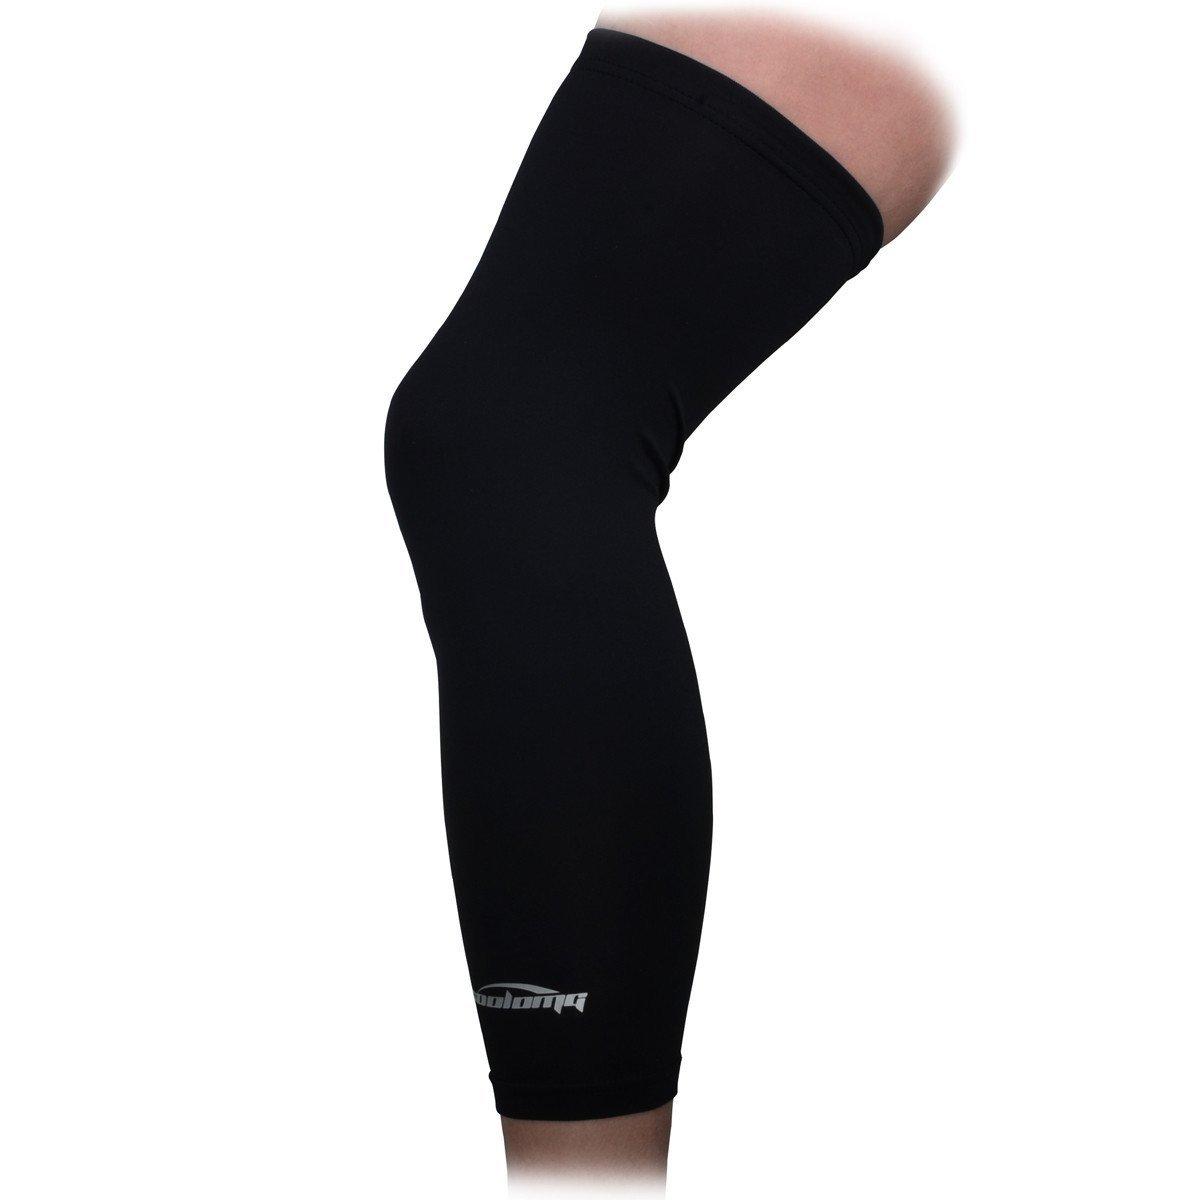 Basketball Leg Knee Long Sleeve Compression Leg Sleeves Football And Basketball Basketball Leg Sleeves